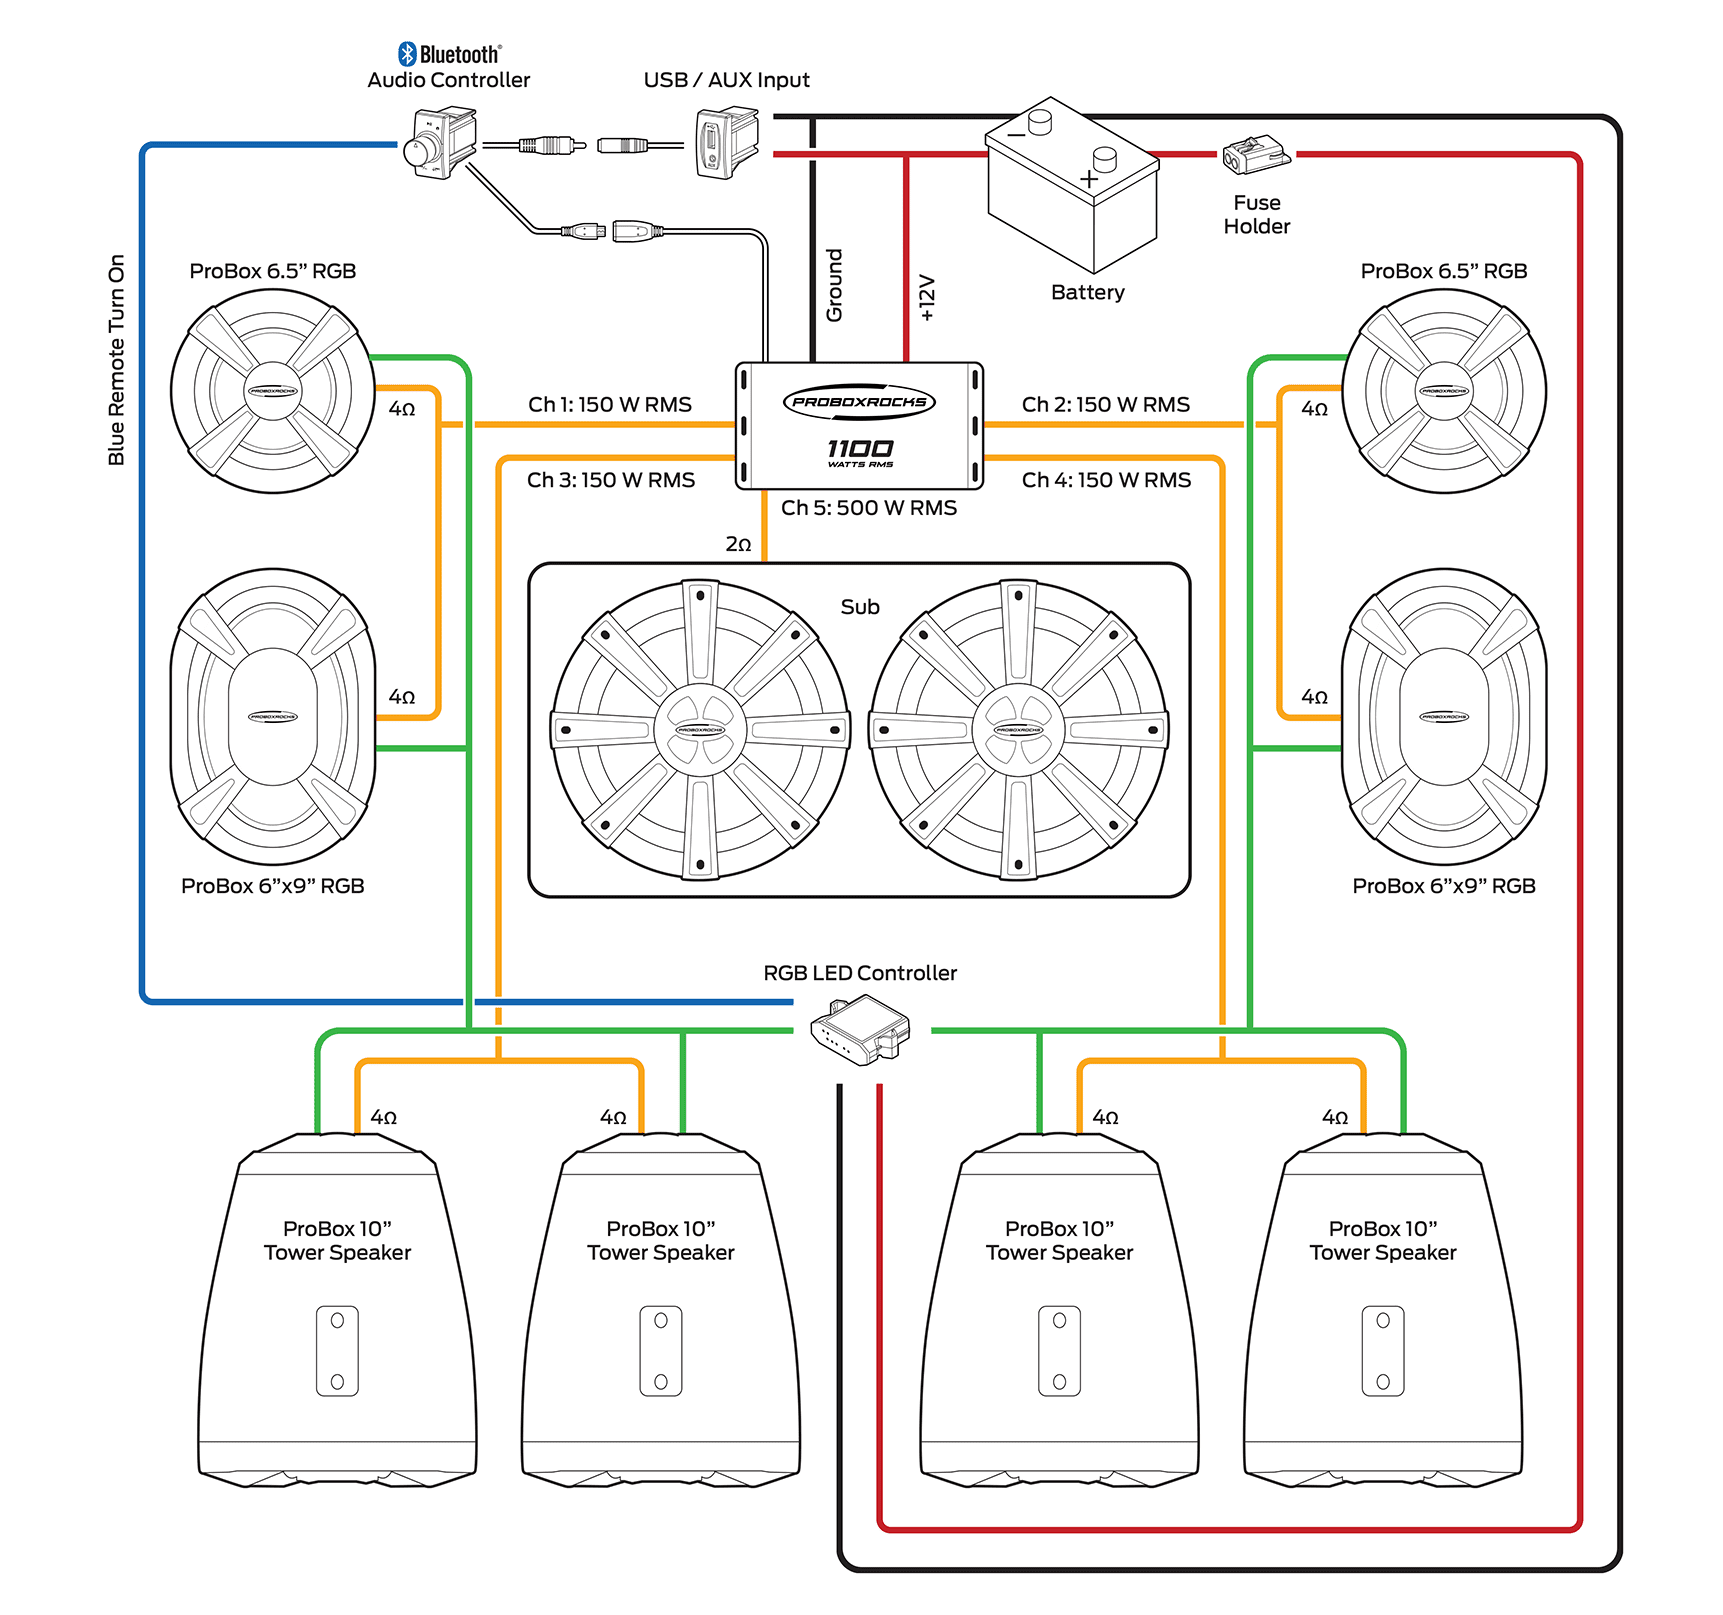 Diagram Toyota Probox Wiring Diagram Full Version Hd Quality Wiring Diagram Micaelab Wiras Nu